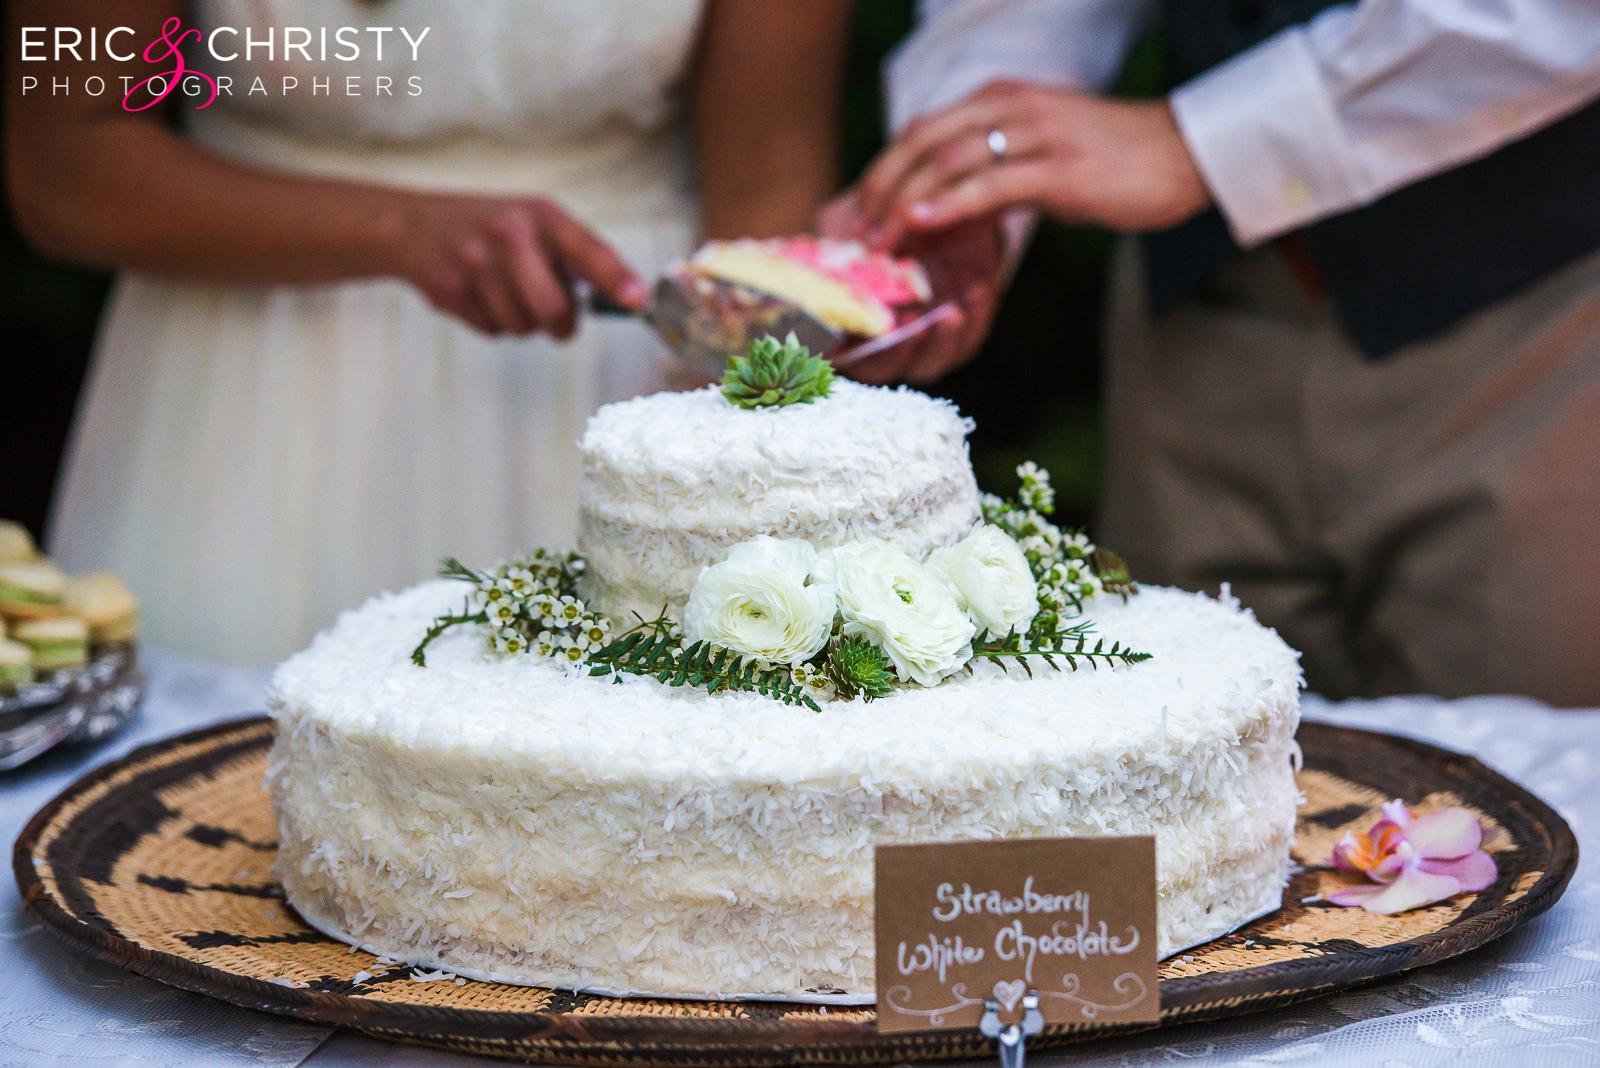 Eric & Christy\'s Blog || Ohio Wedding & Portrait Photography: Shelby ...